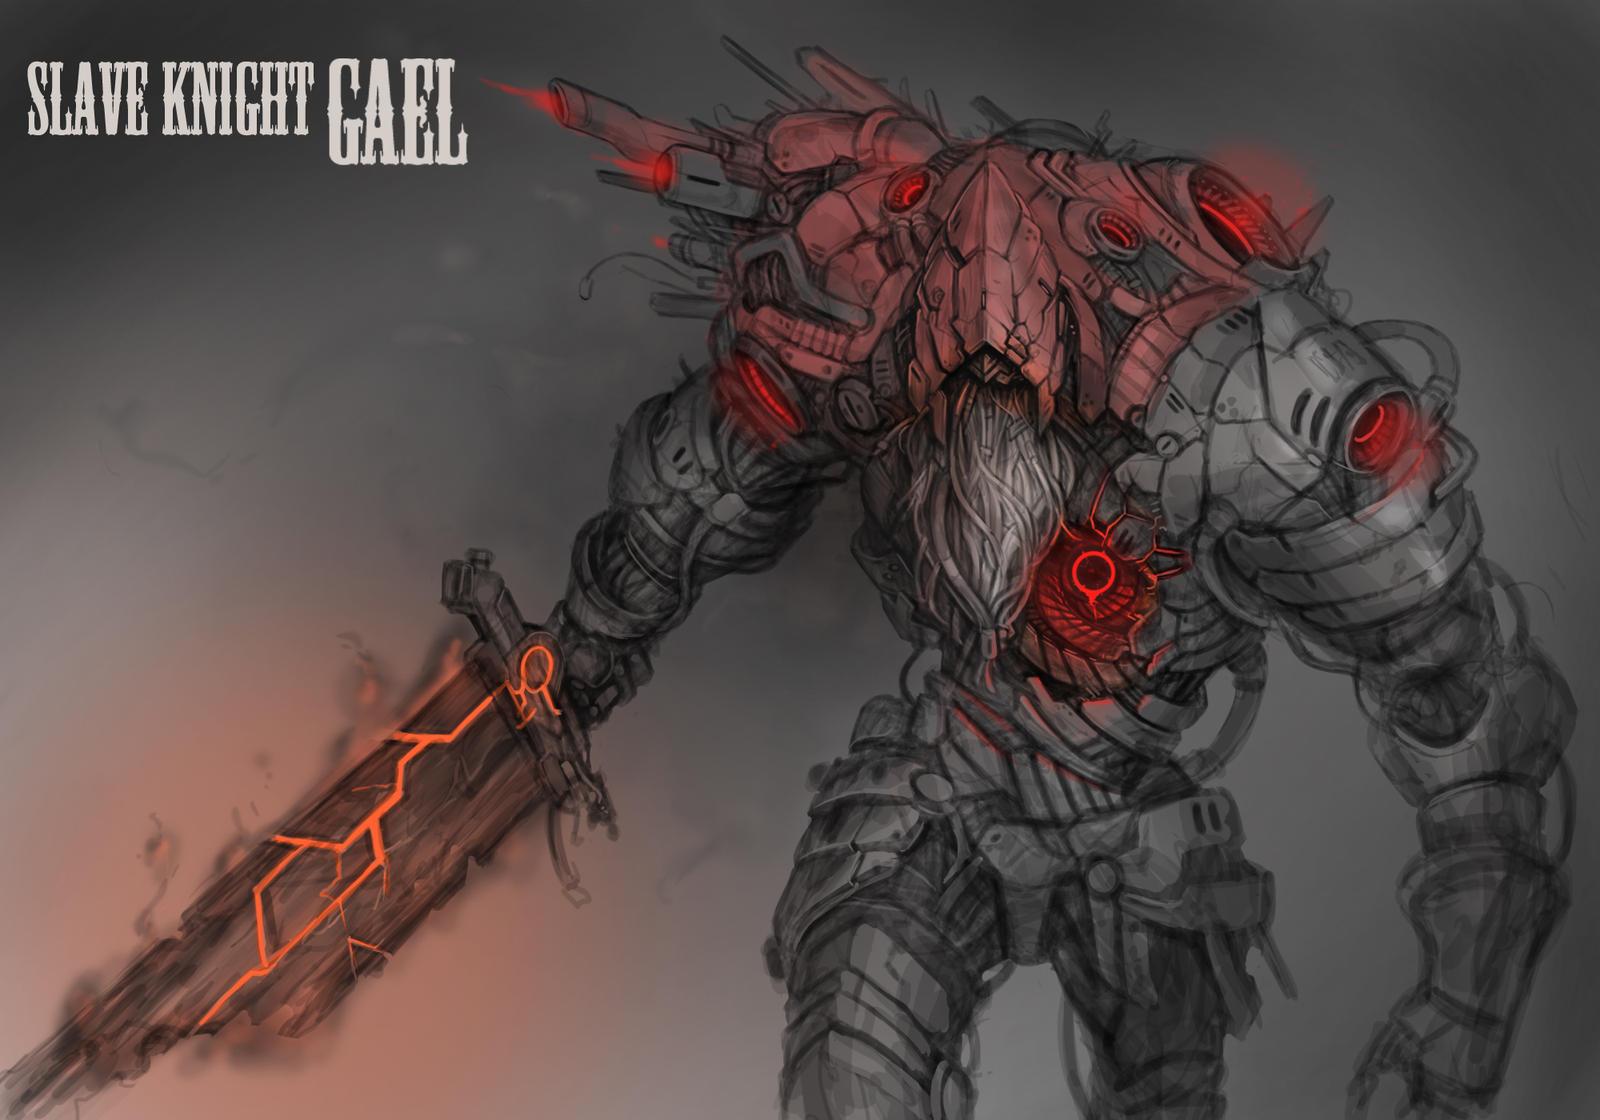 Robot Slave Knight Gael By Muhut On Deviantart